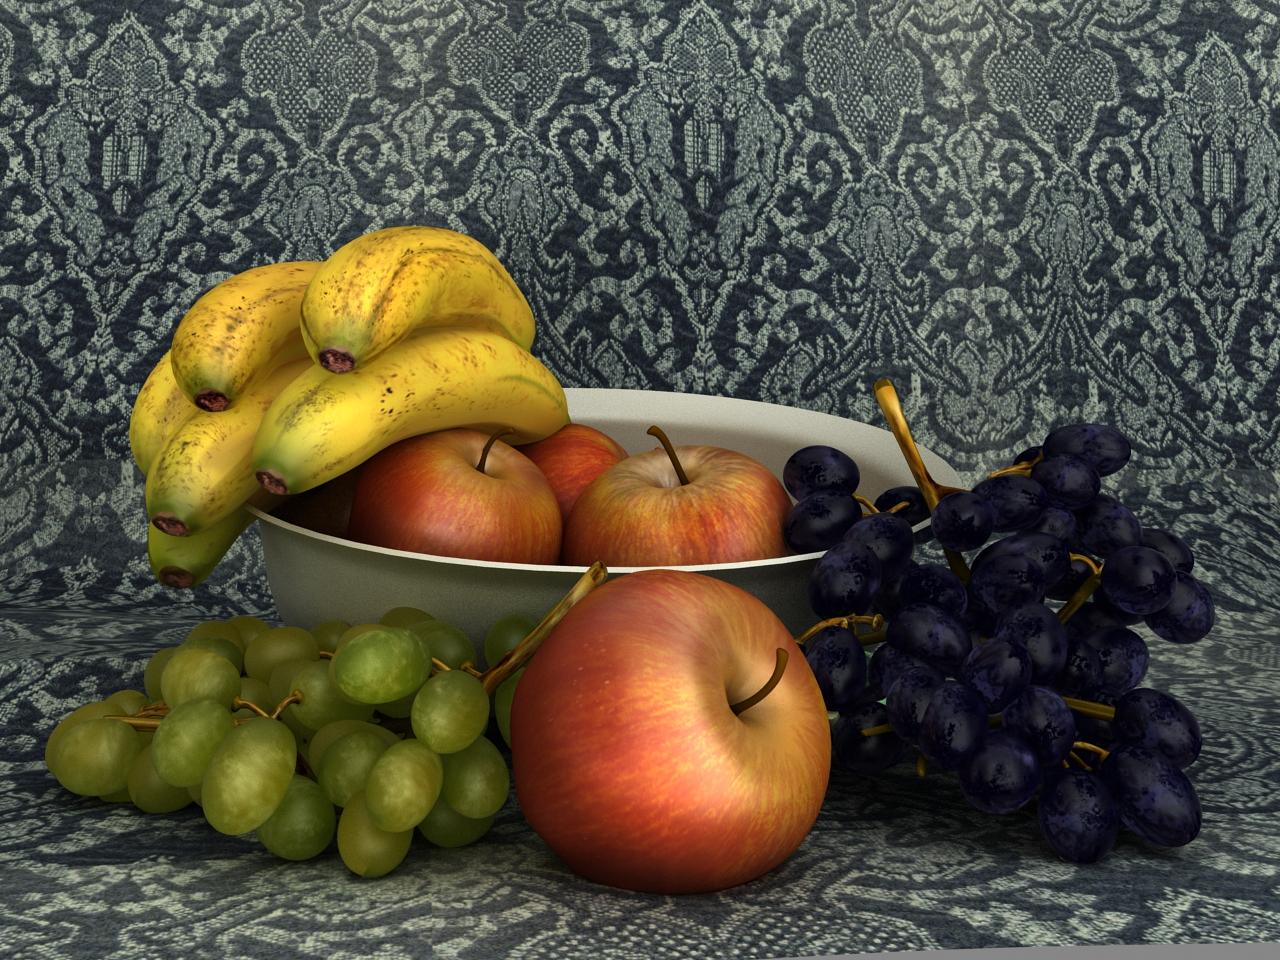 Soorajkverma cg fruits 1 67da2df7 15td